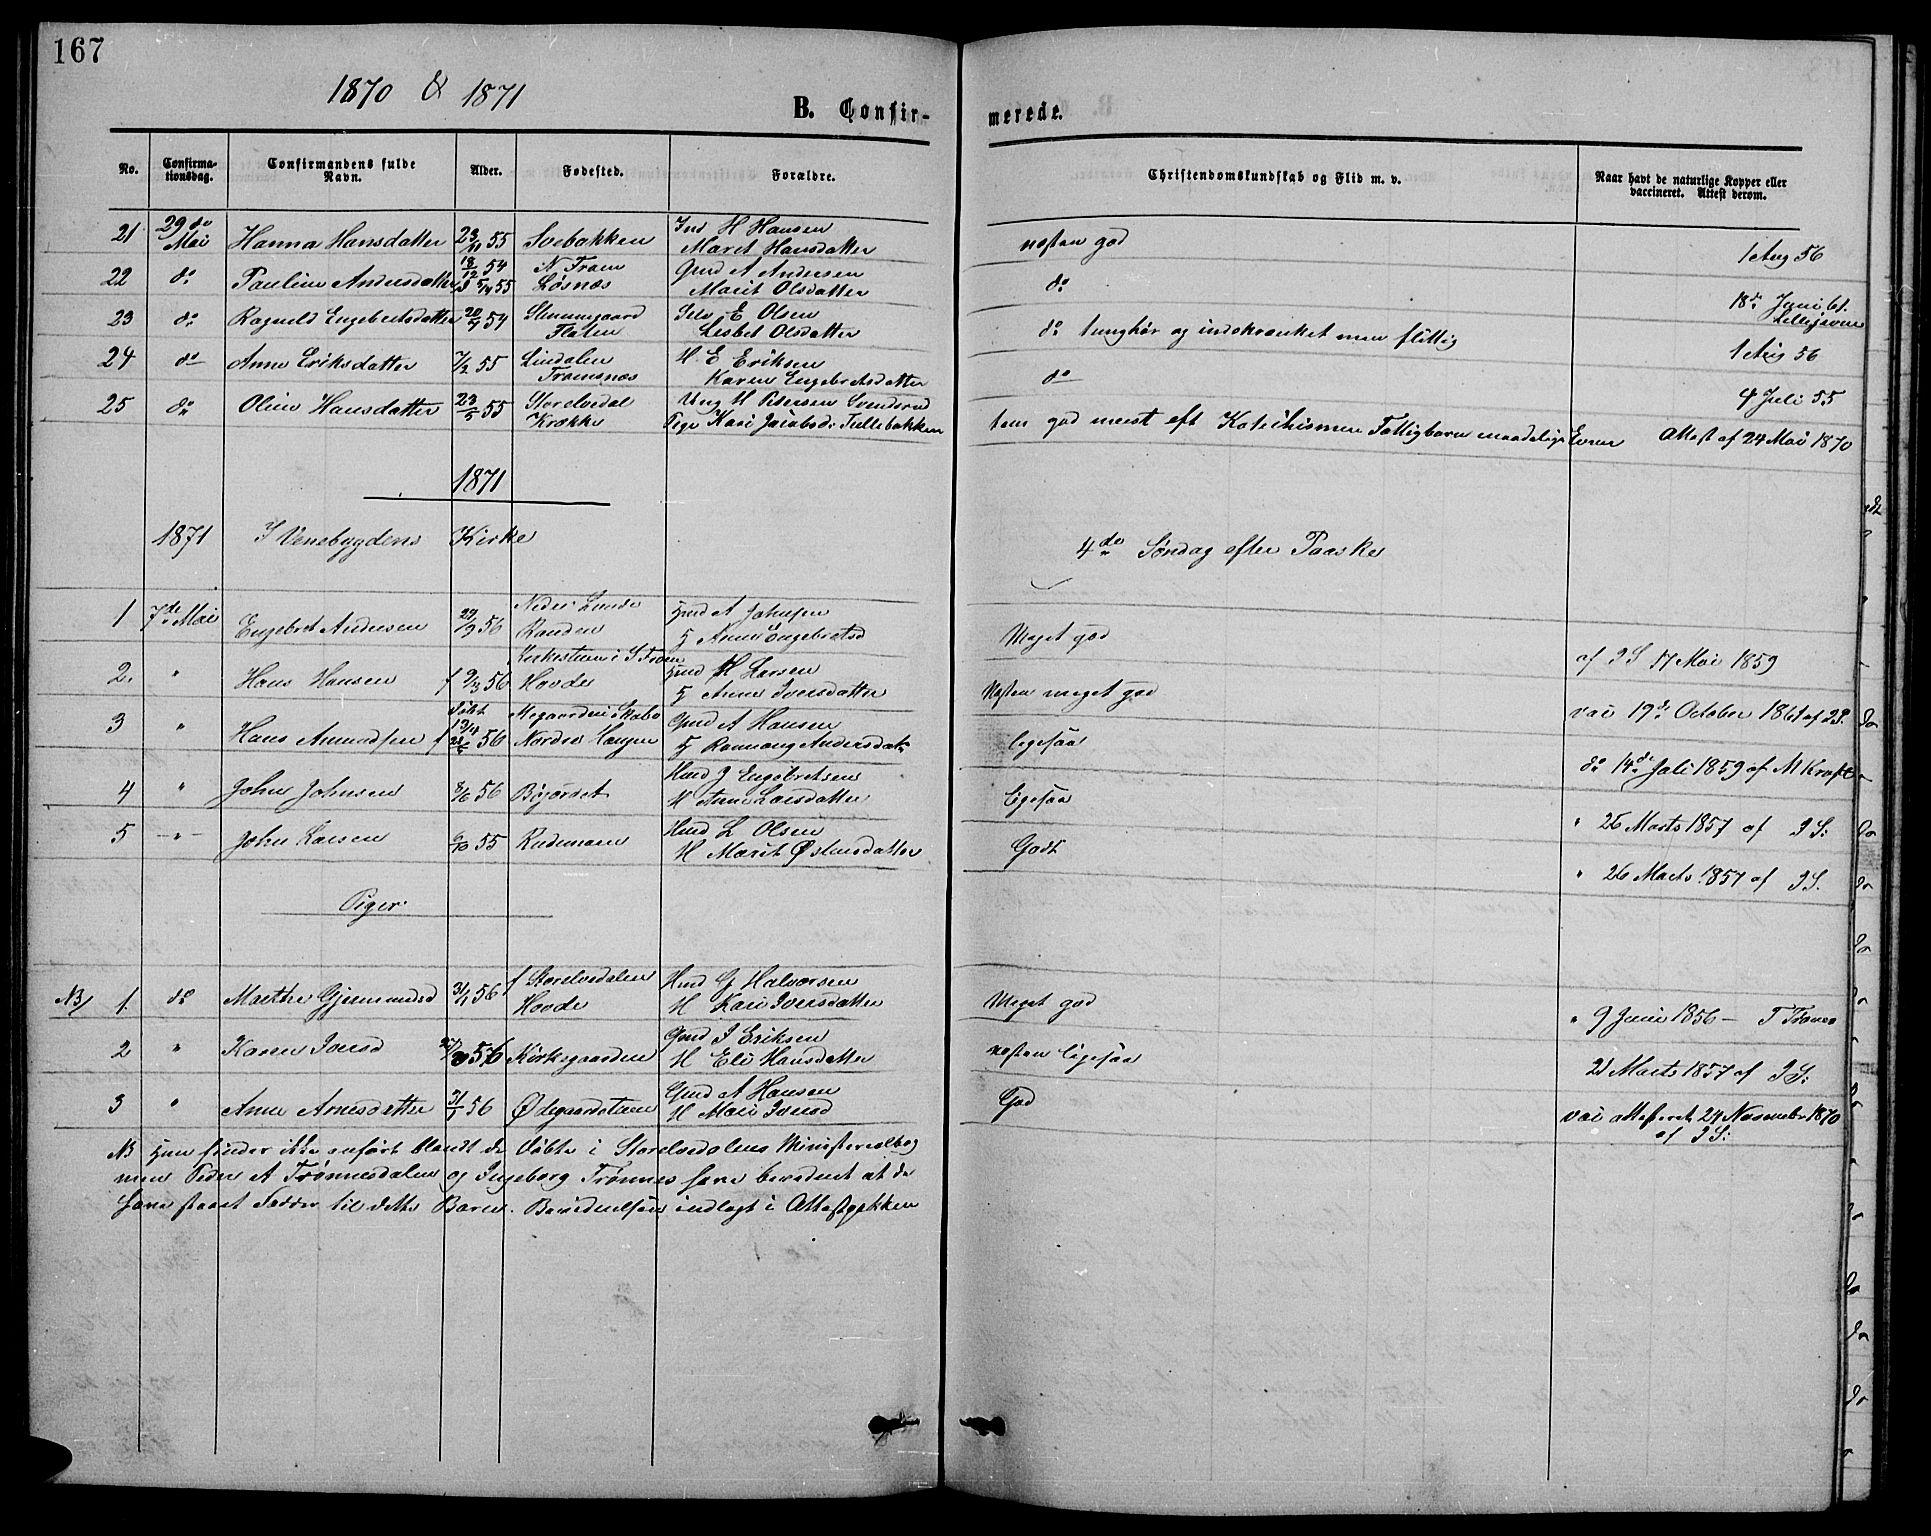 SAH, Ringebu prestekontor, Klokkerbok nr. 4, 1867-1879, s. 167